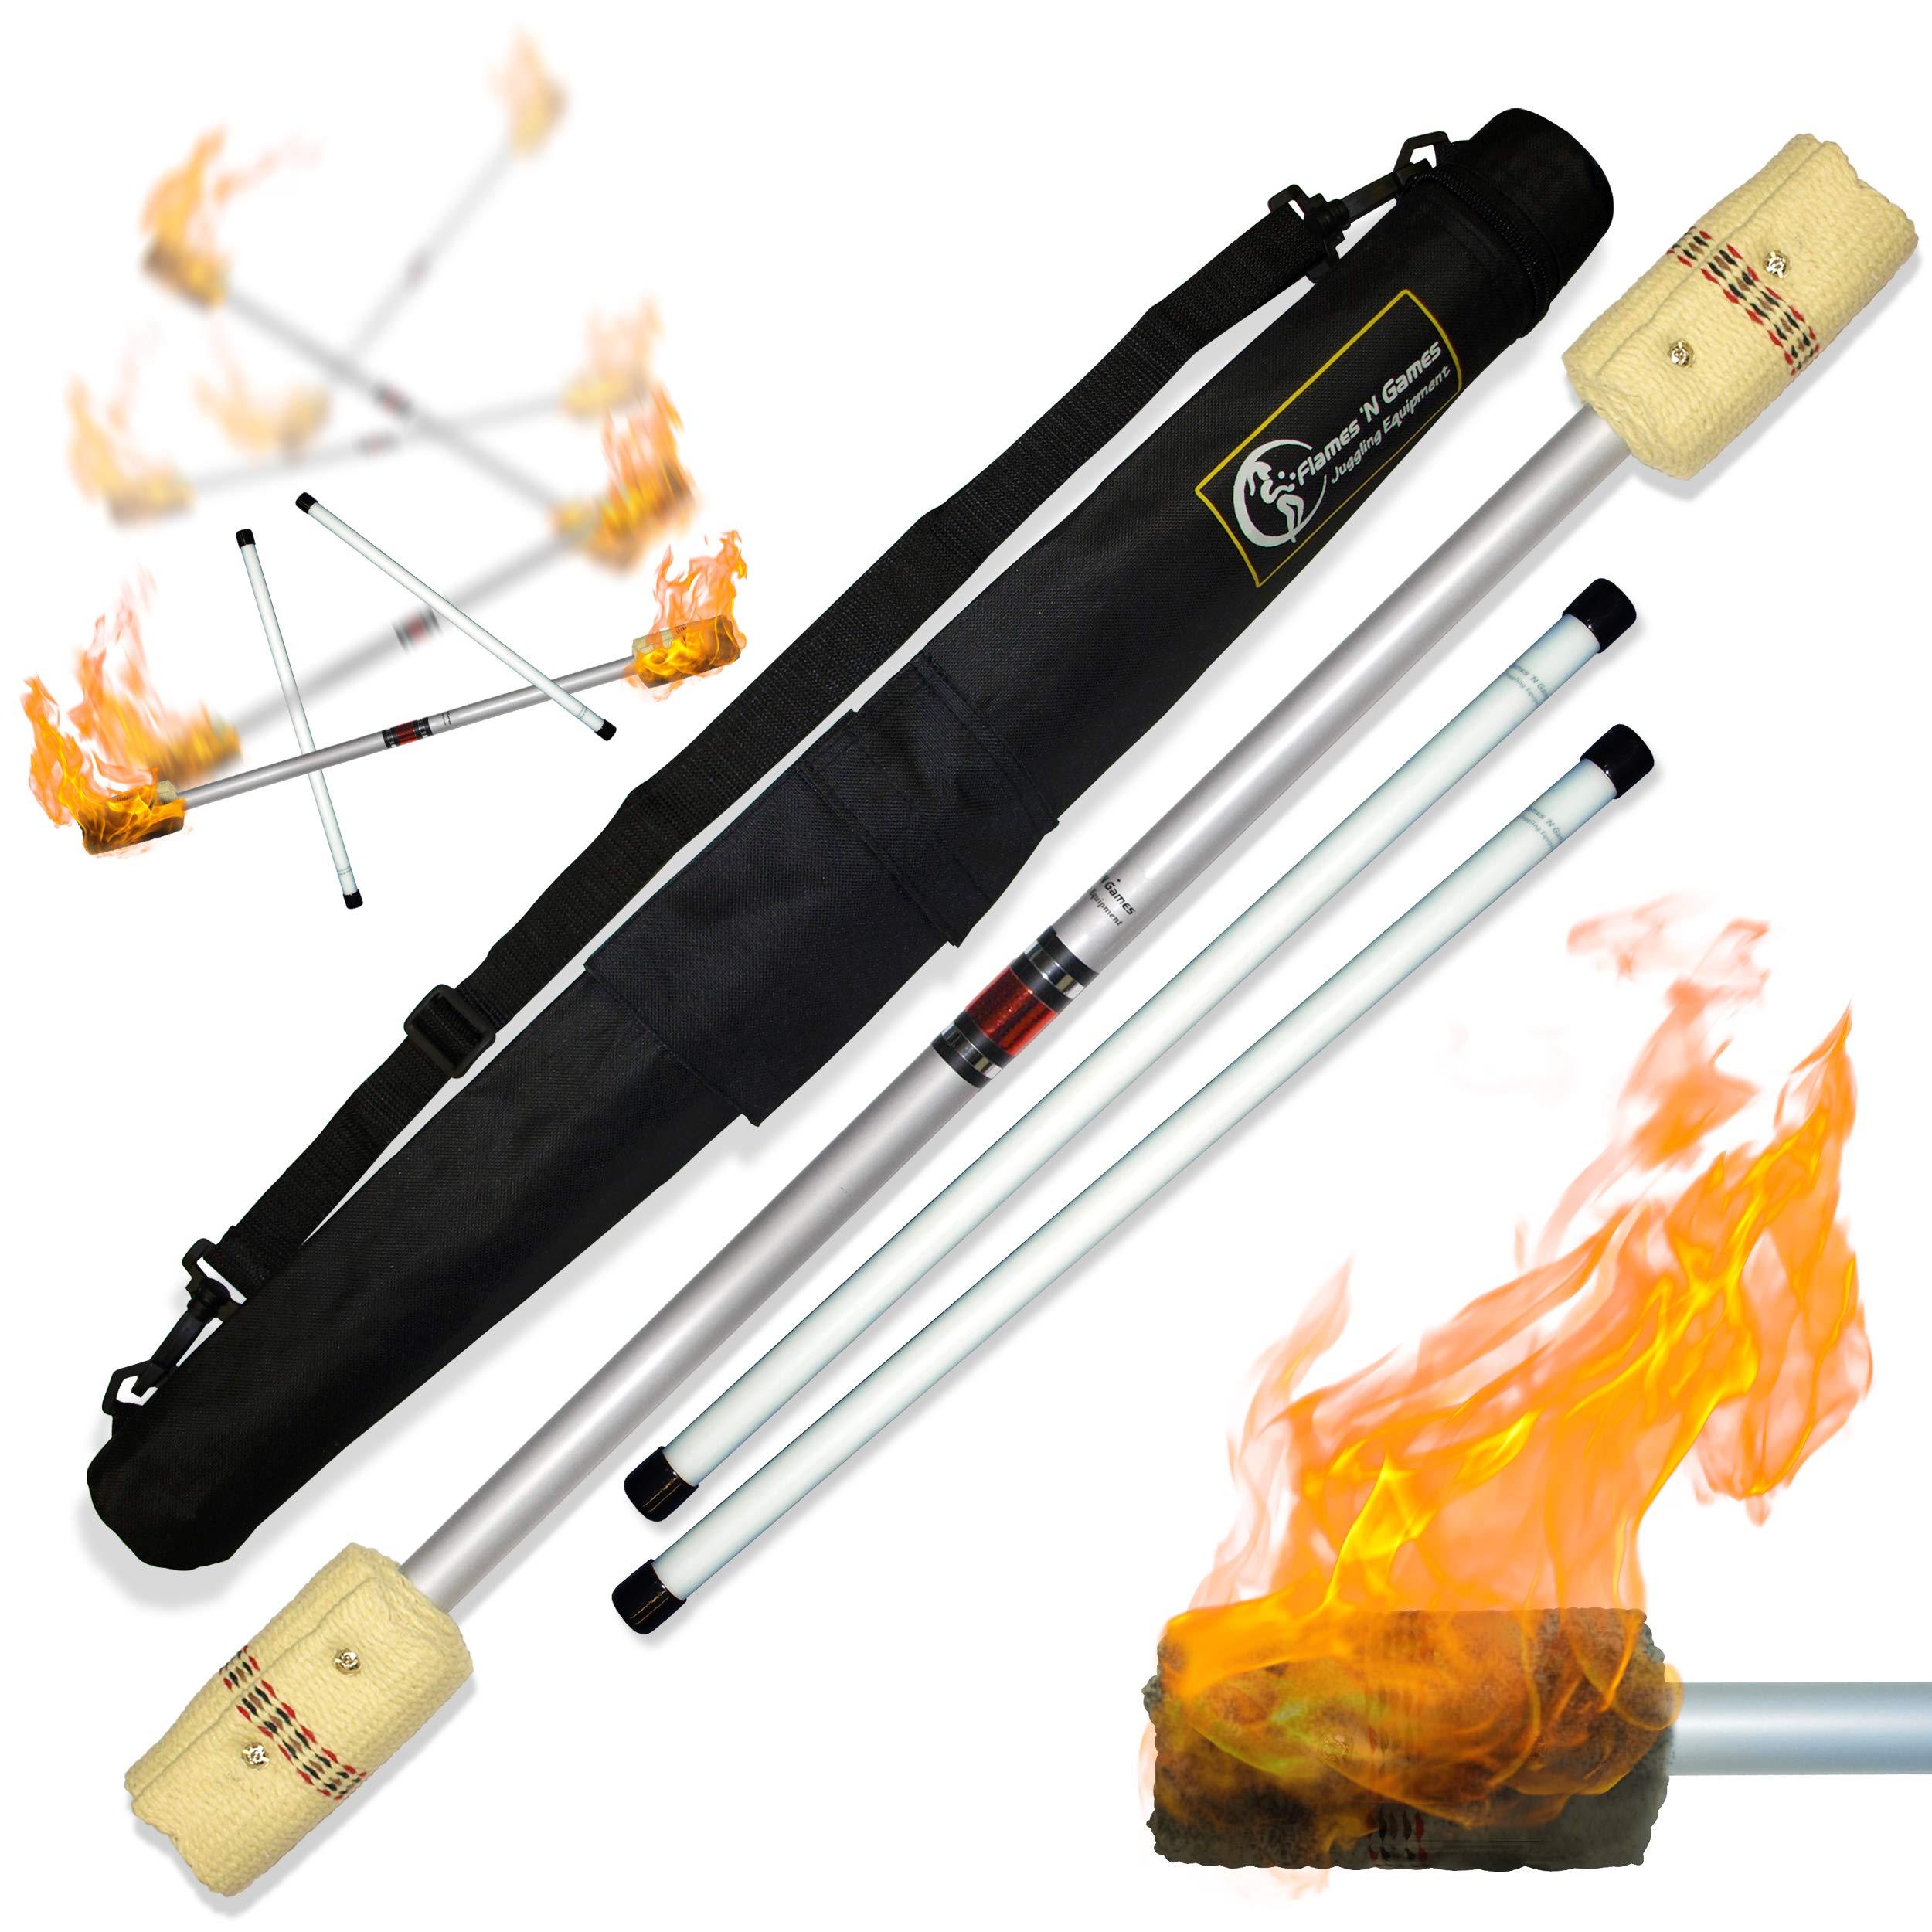 Flames N Games FIRE Devil Stick Set (100mm Wicks) Ultra-Strong FIBRE Sticks + Travel Bag! Juggling Devil sticks for Beginners & Pro's alike! by Flames N Games Fire Devil Sticks/Flower Sticks